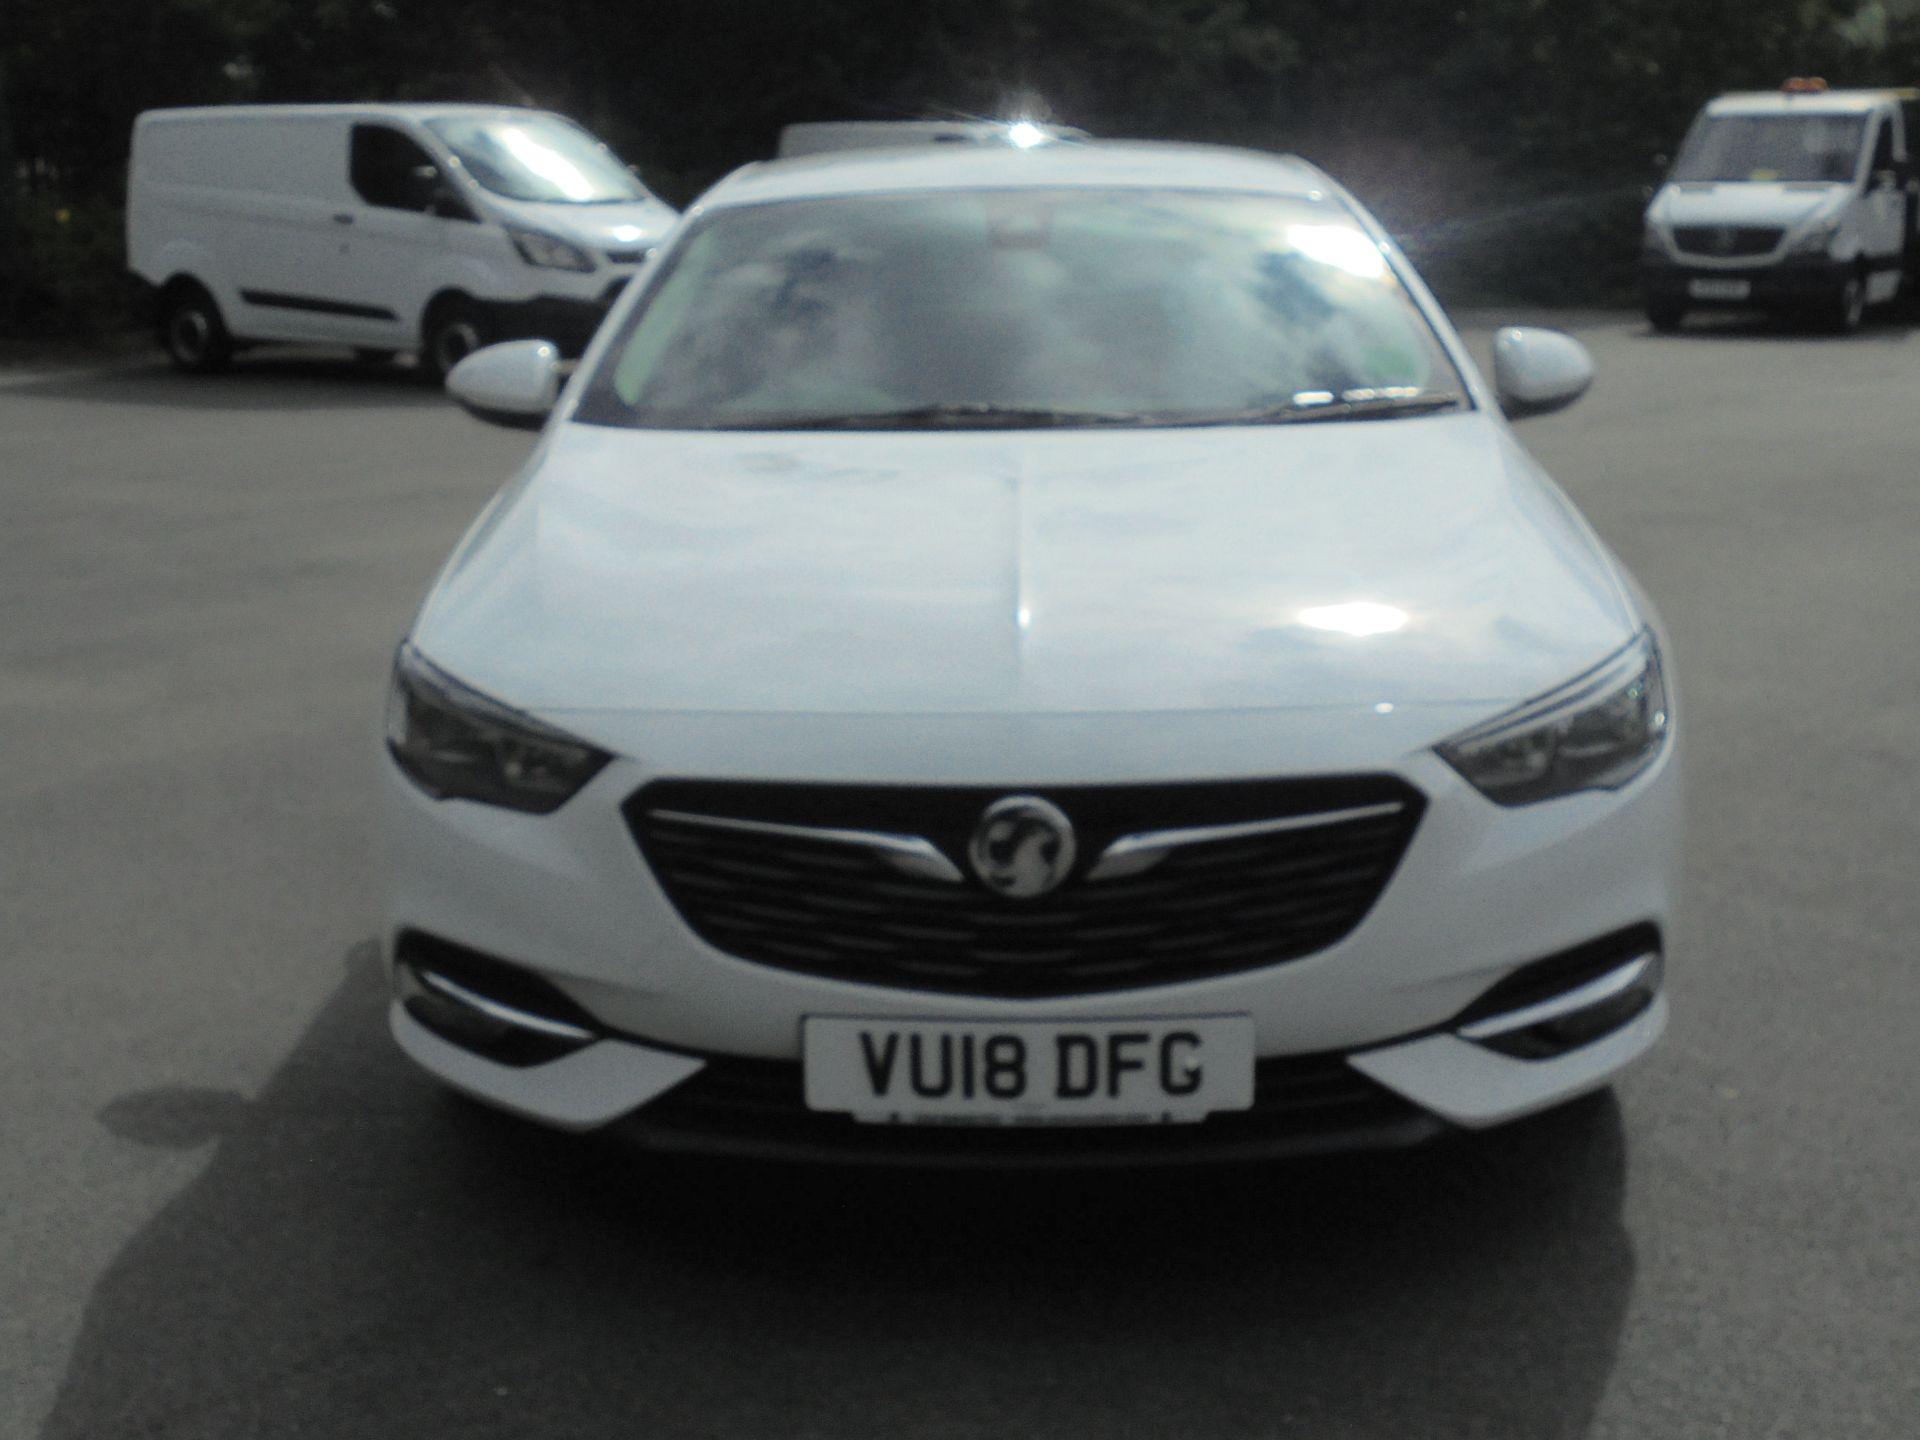 2018 Vauxhall Insignia 1.6 Grand Sport Turbo D Ecotec [136] Sri Nav 5Dr (VU18DFG) Image 3